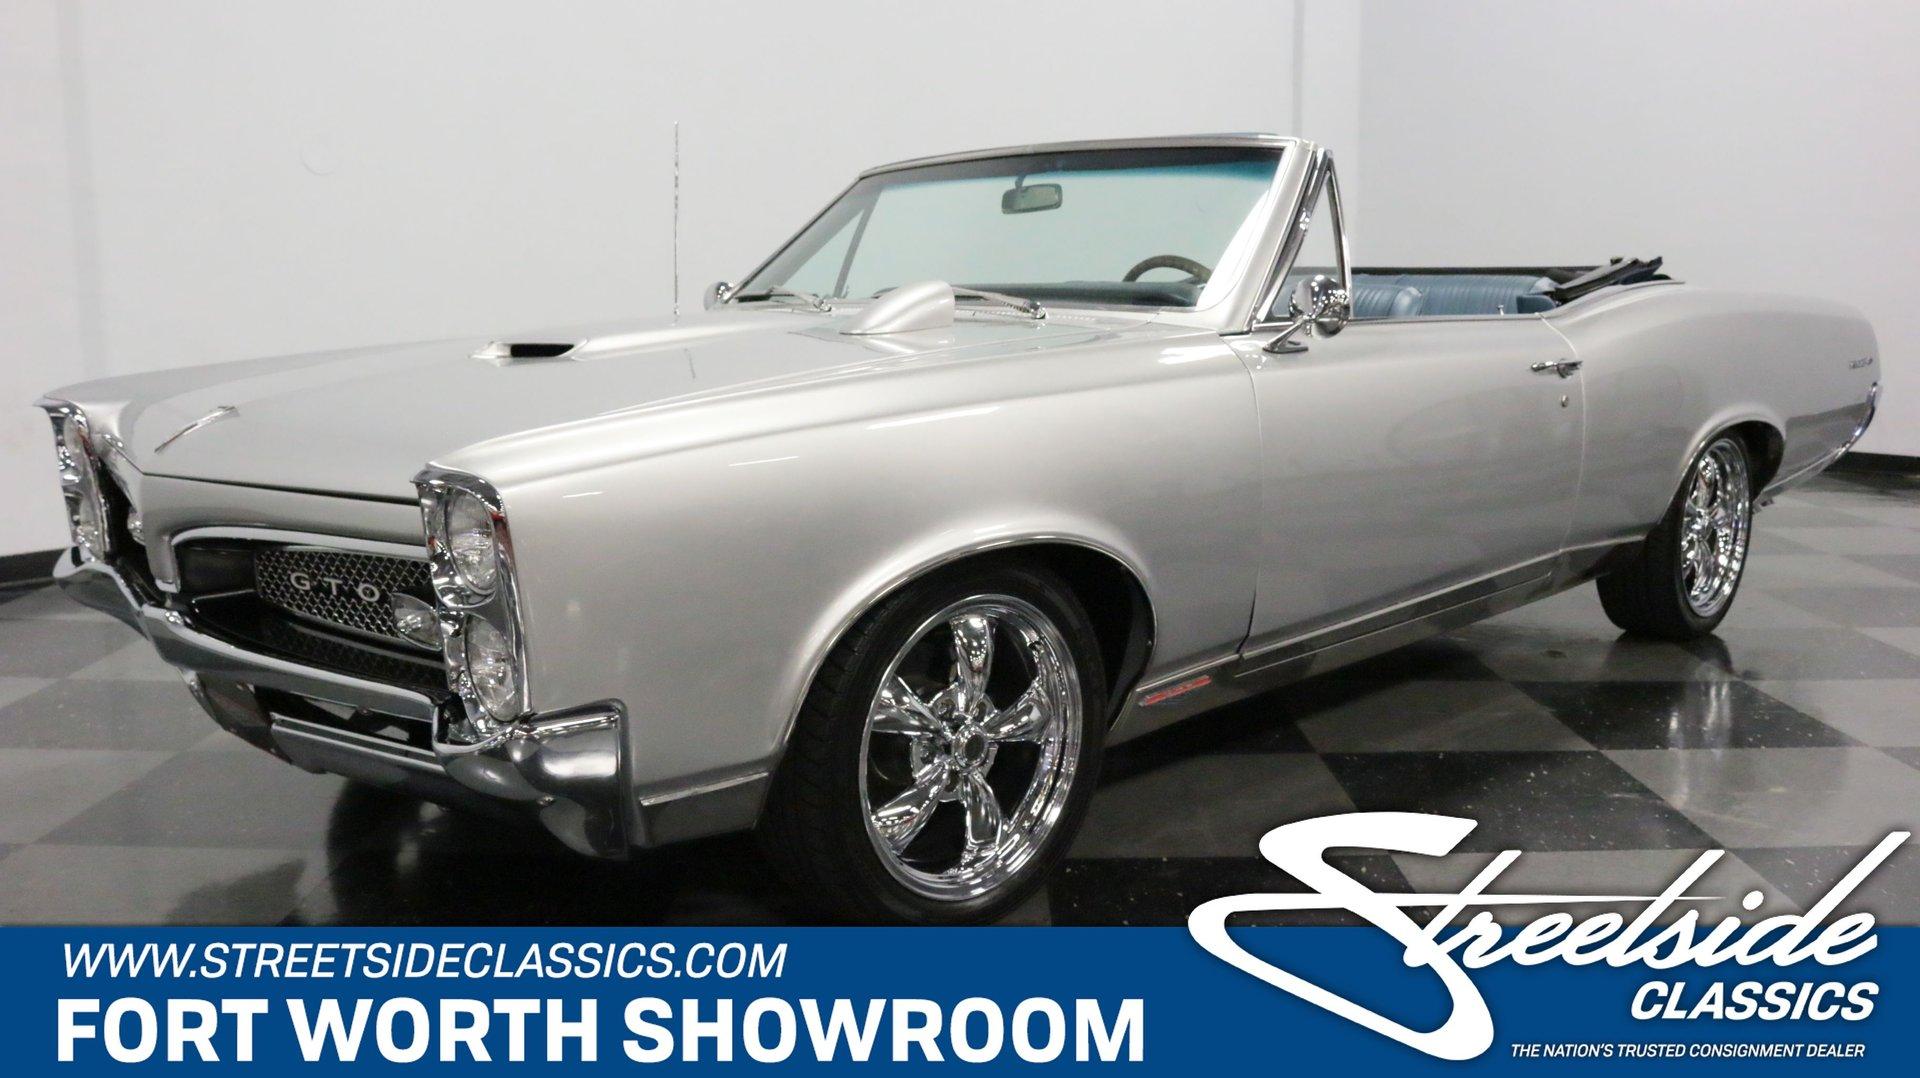 1967 Pontiac GTO Tribute Convertible for sale #174384